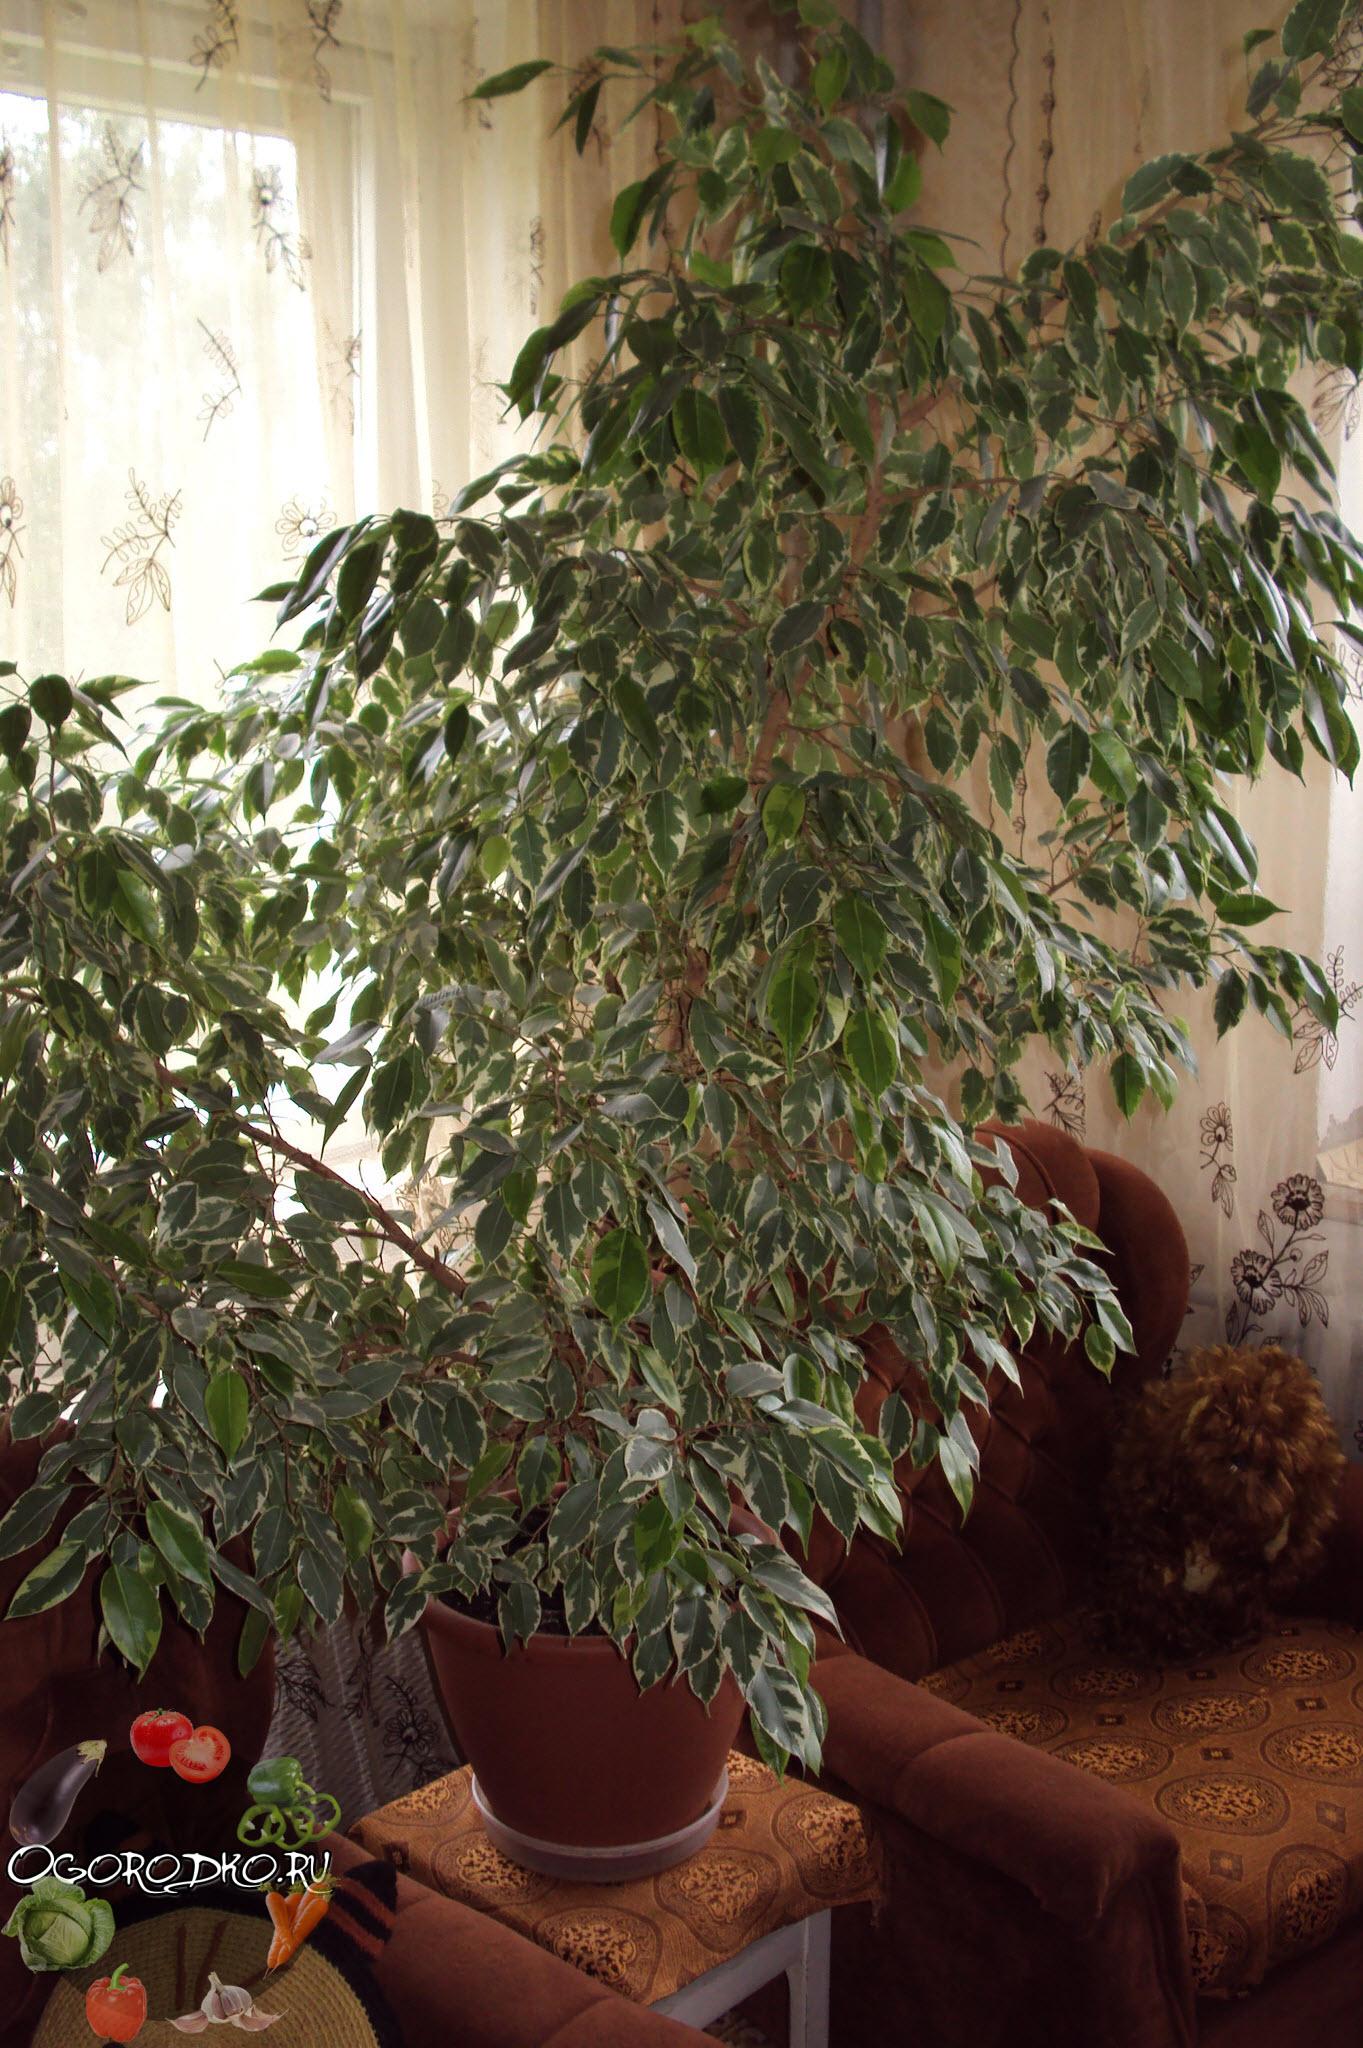 Цветок фикус комнатный: фото видов 36